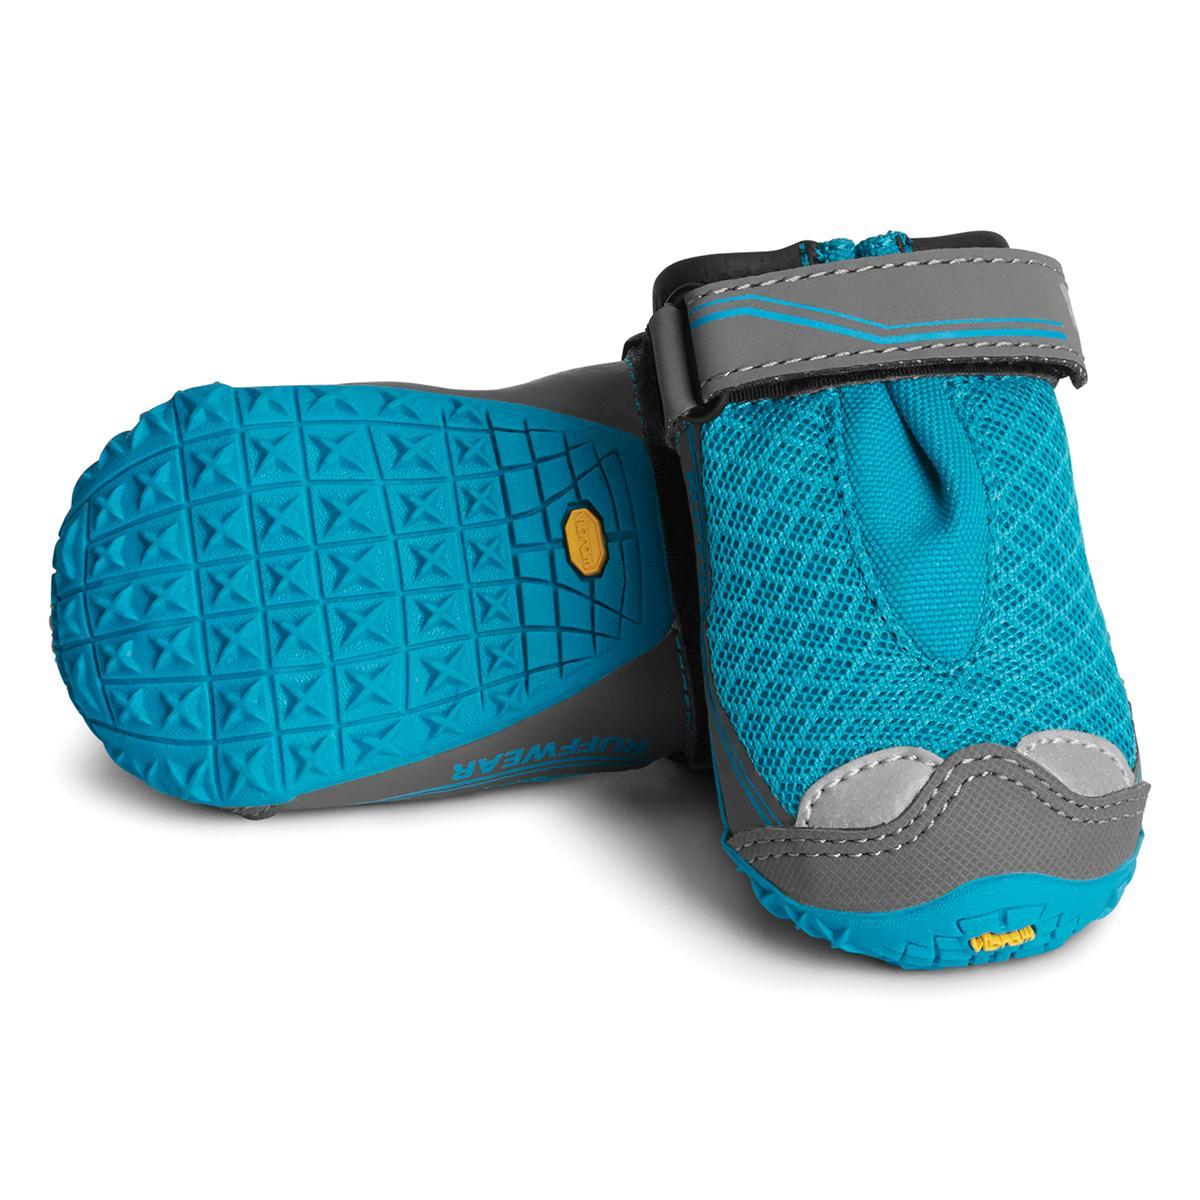 Grip Trex Dog Boots by RuffWear - 2 Pack - Blue Spring